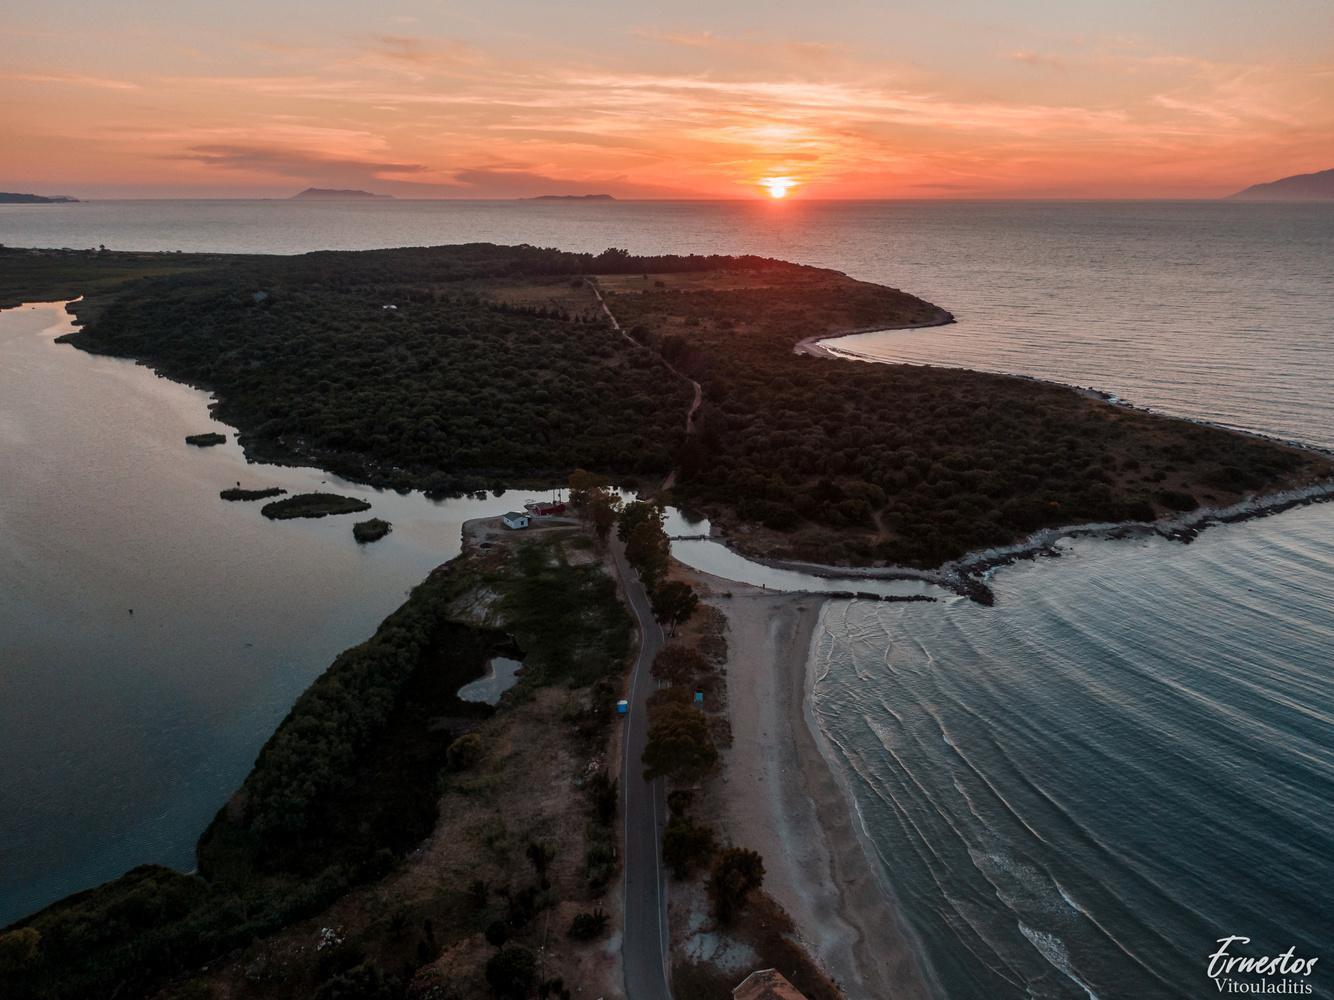 Corfu Agios Spiridon beach by ernestos vitouladitis